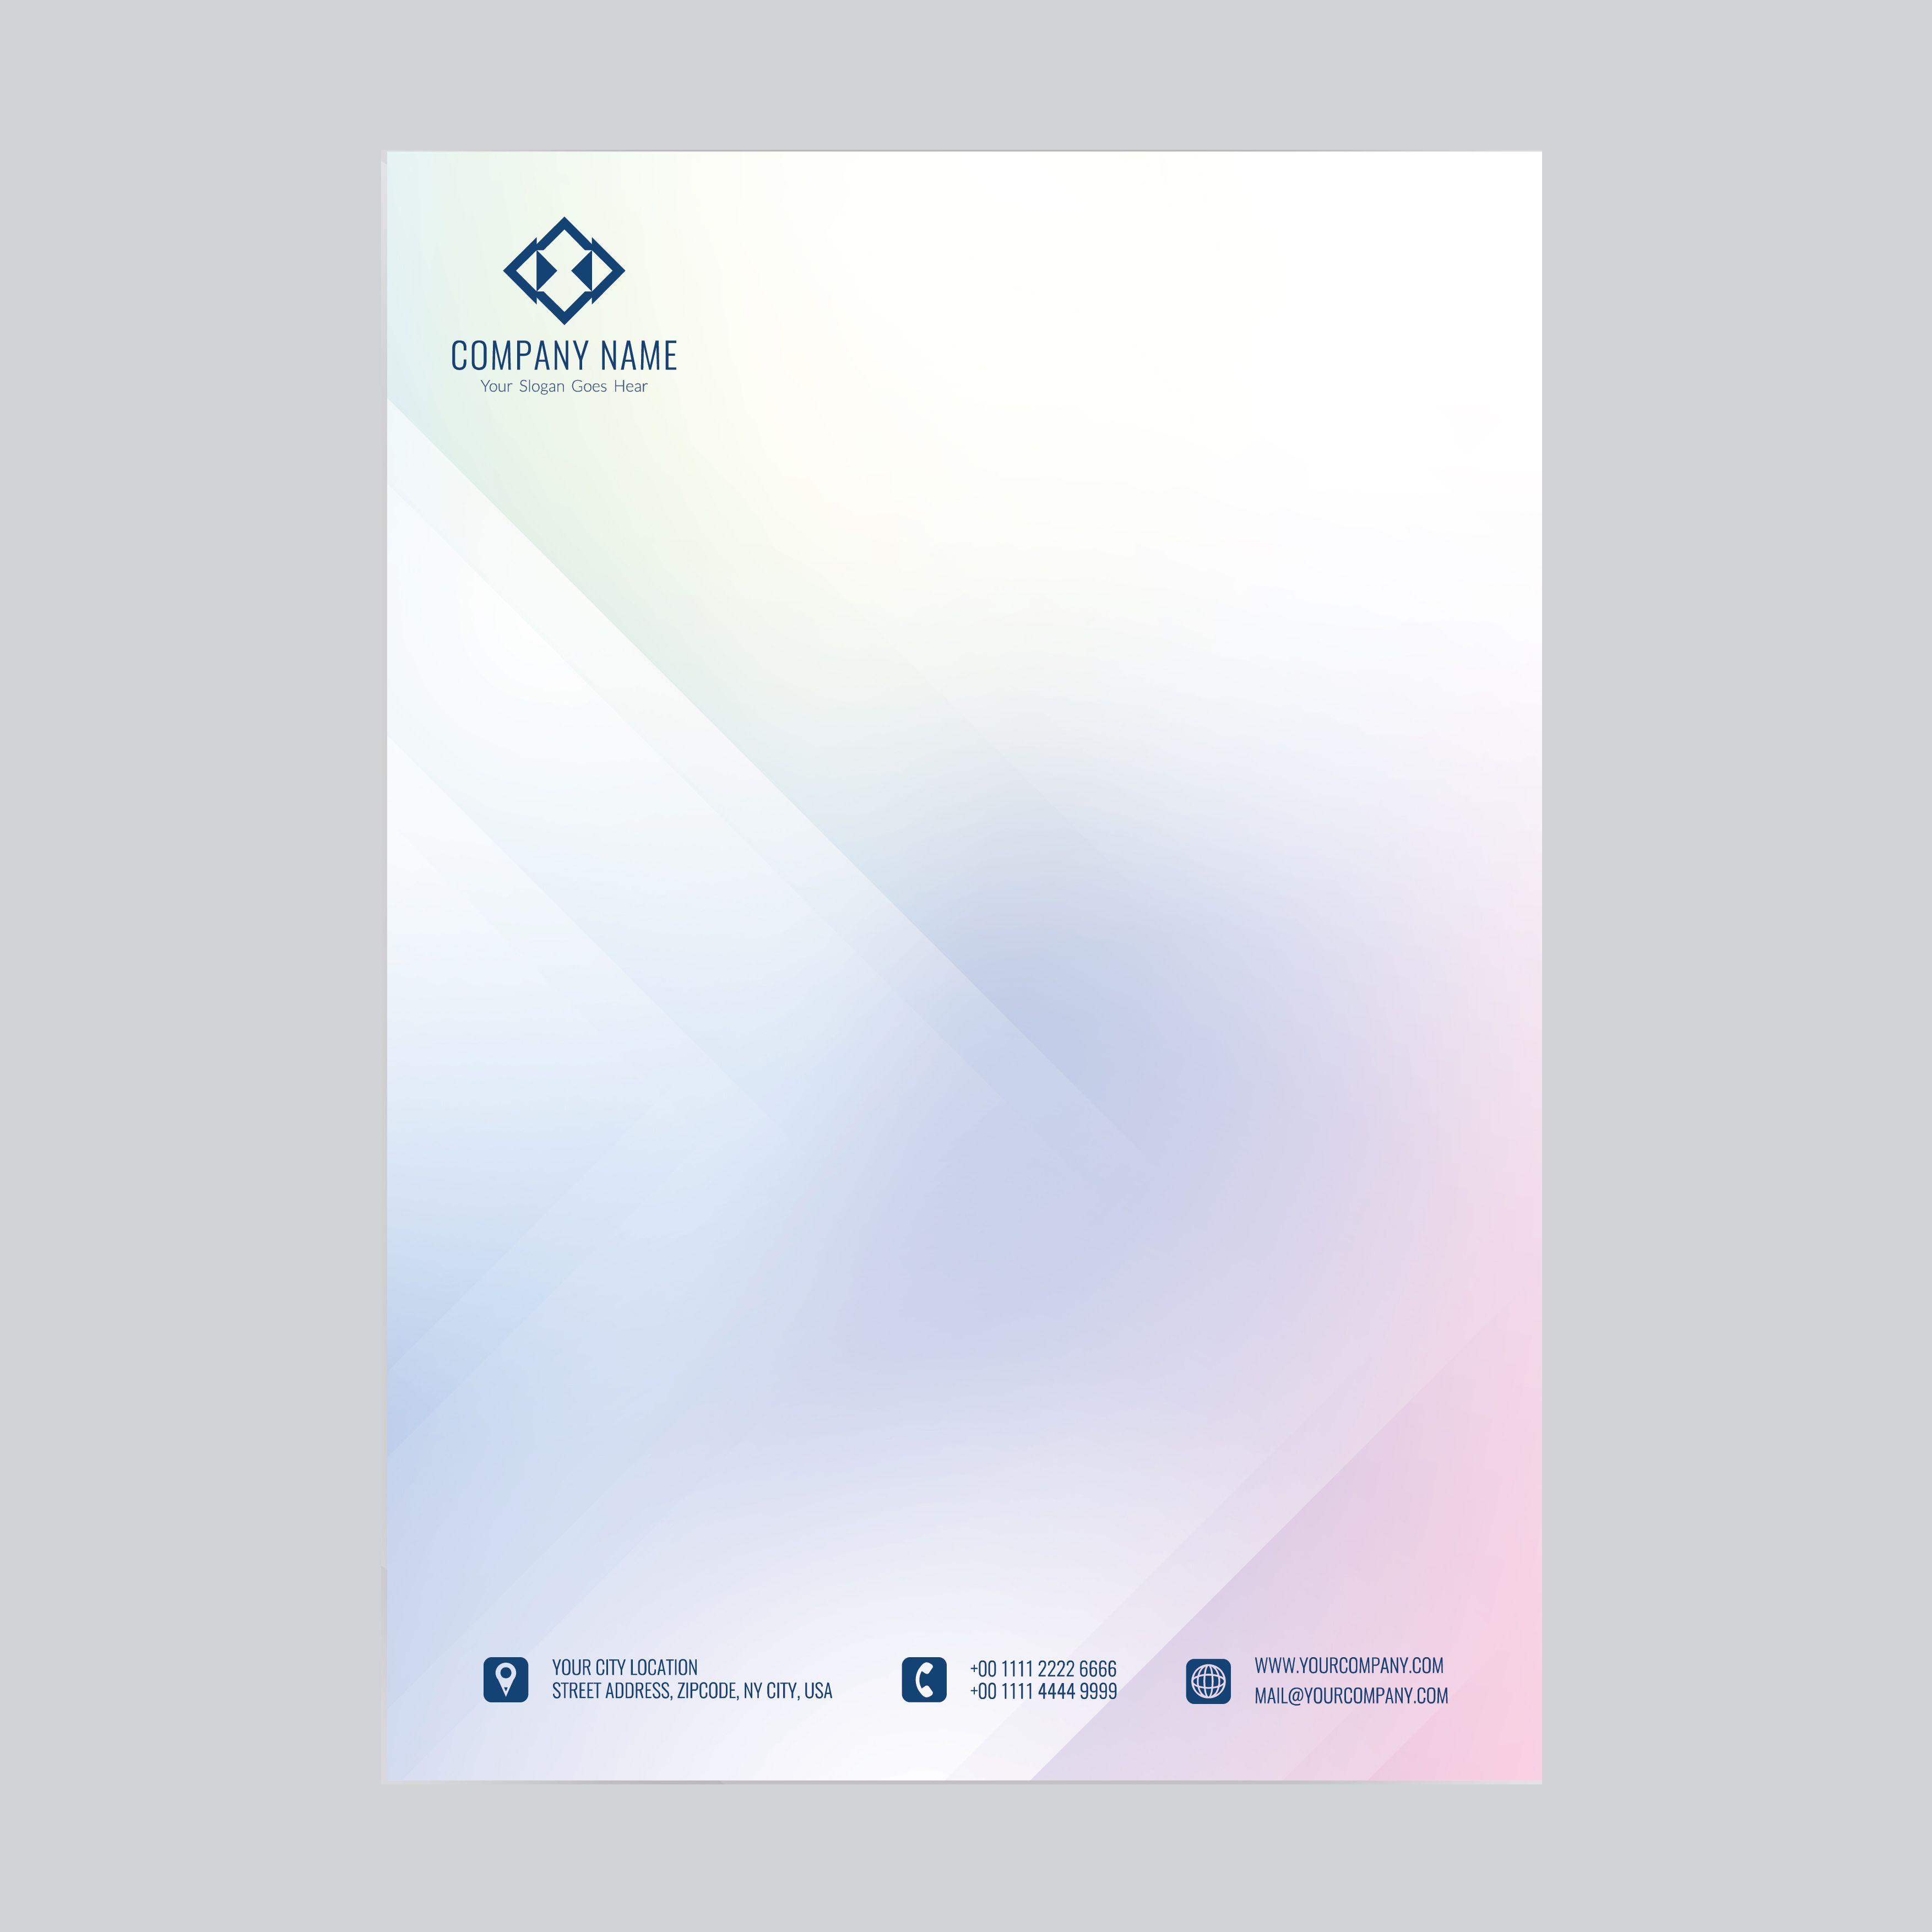 Insta Print All Letterhead